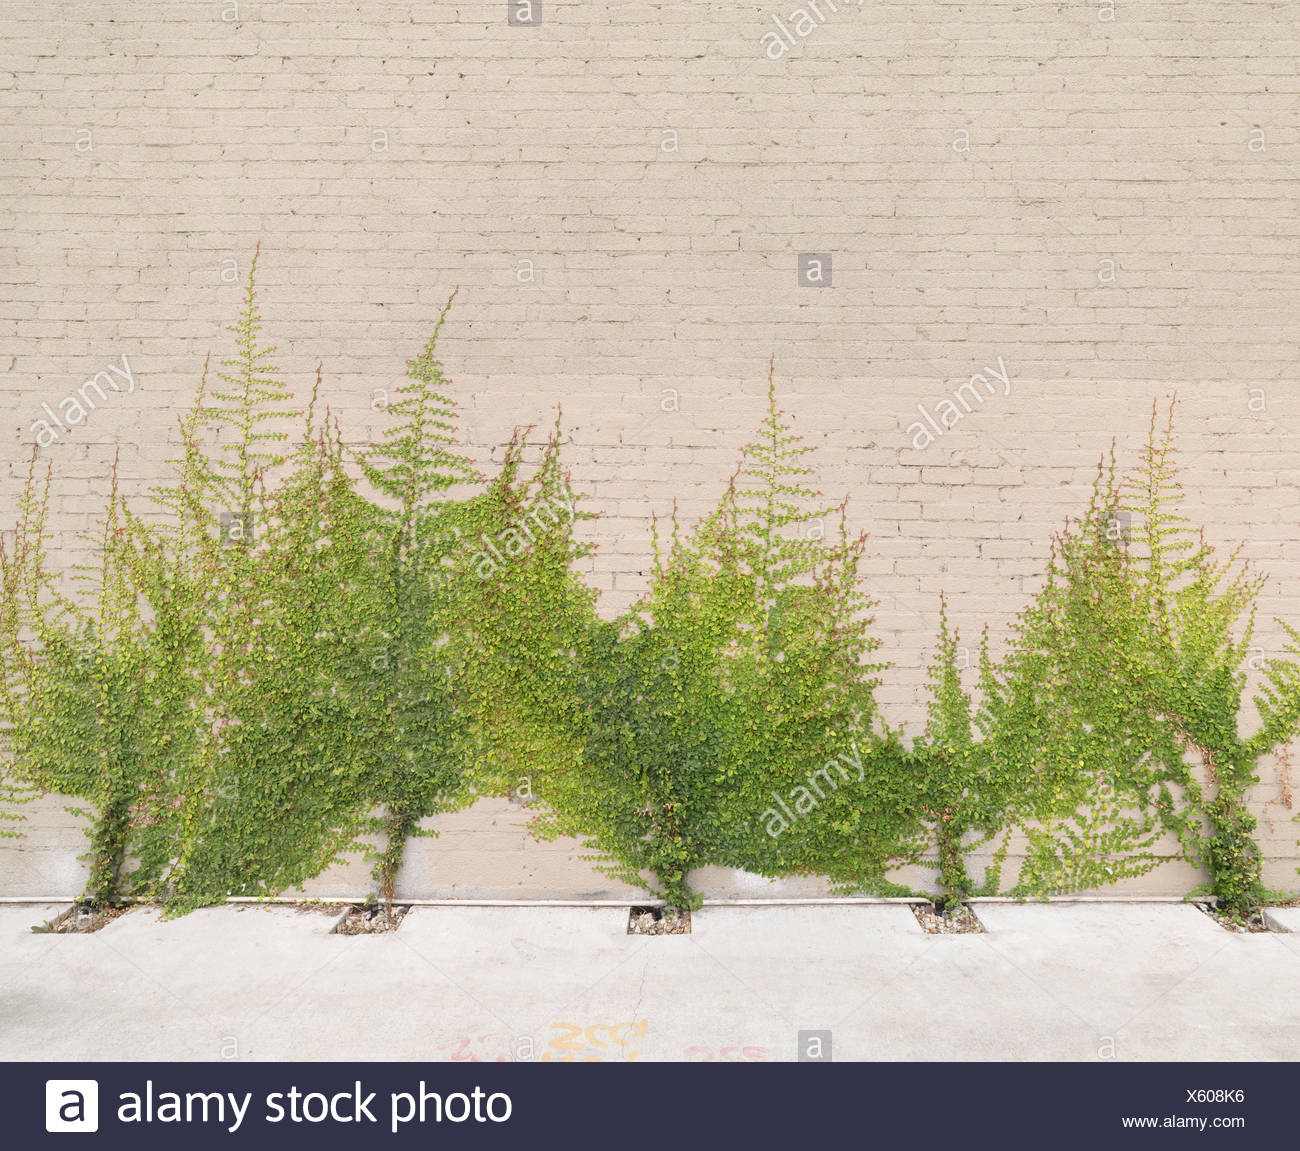 Tree-like Ivy growing on wall - Stock Image